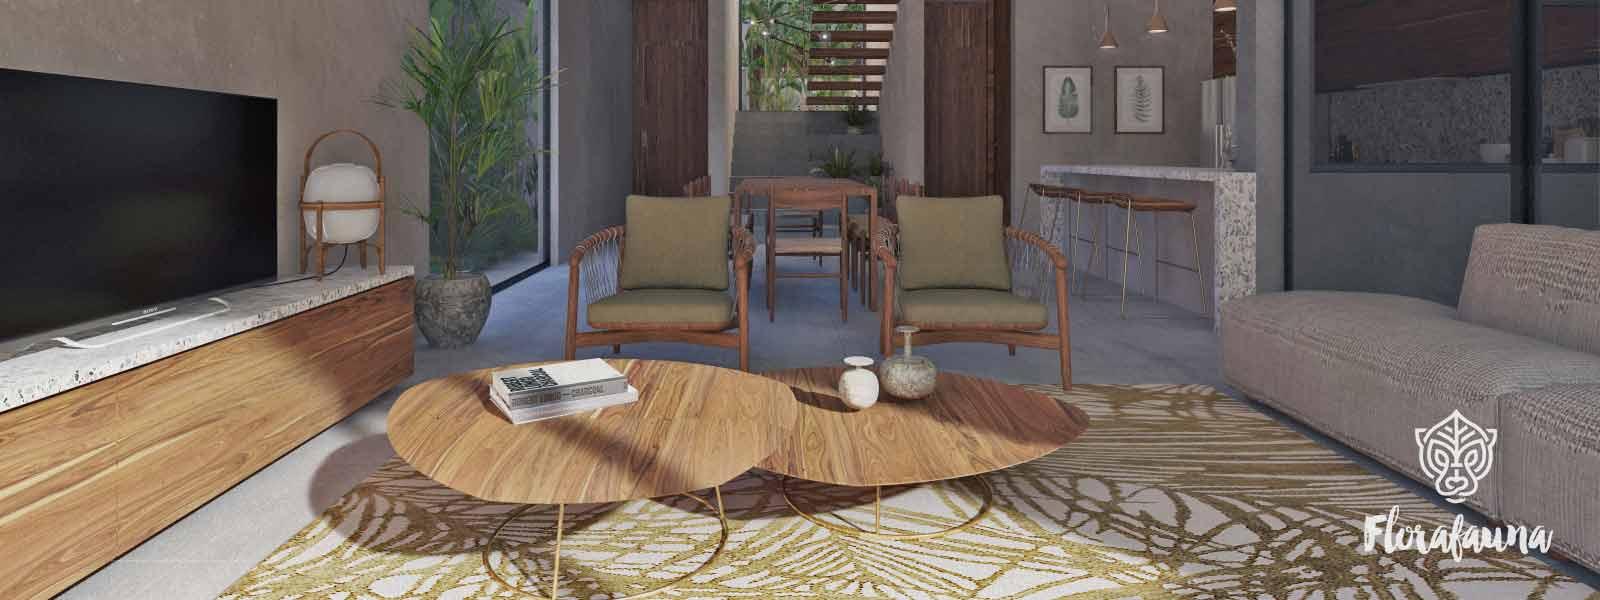 Florafauna-Tulum-CENTER-HOME_Living